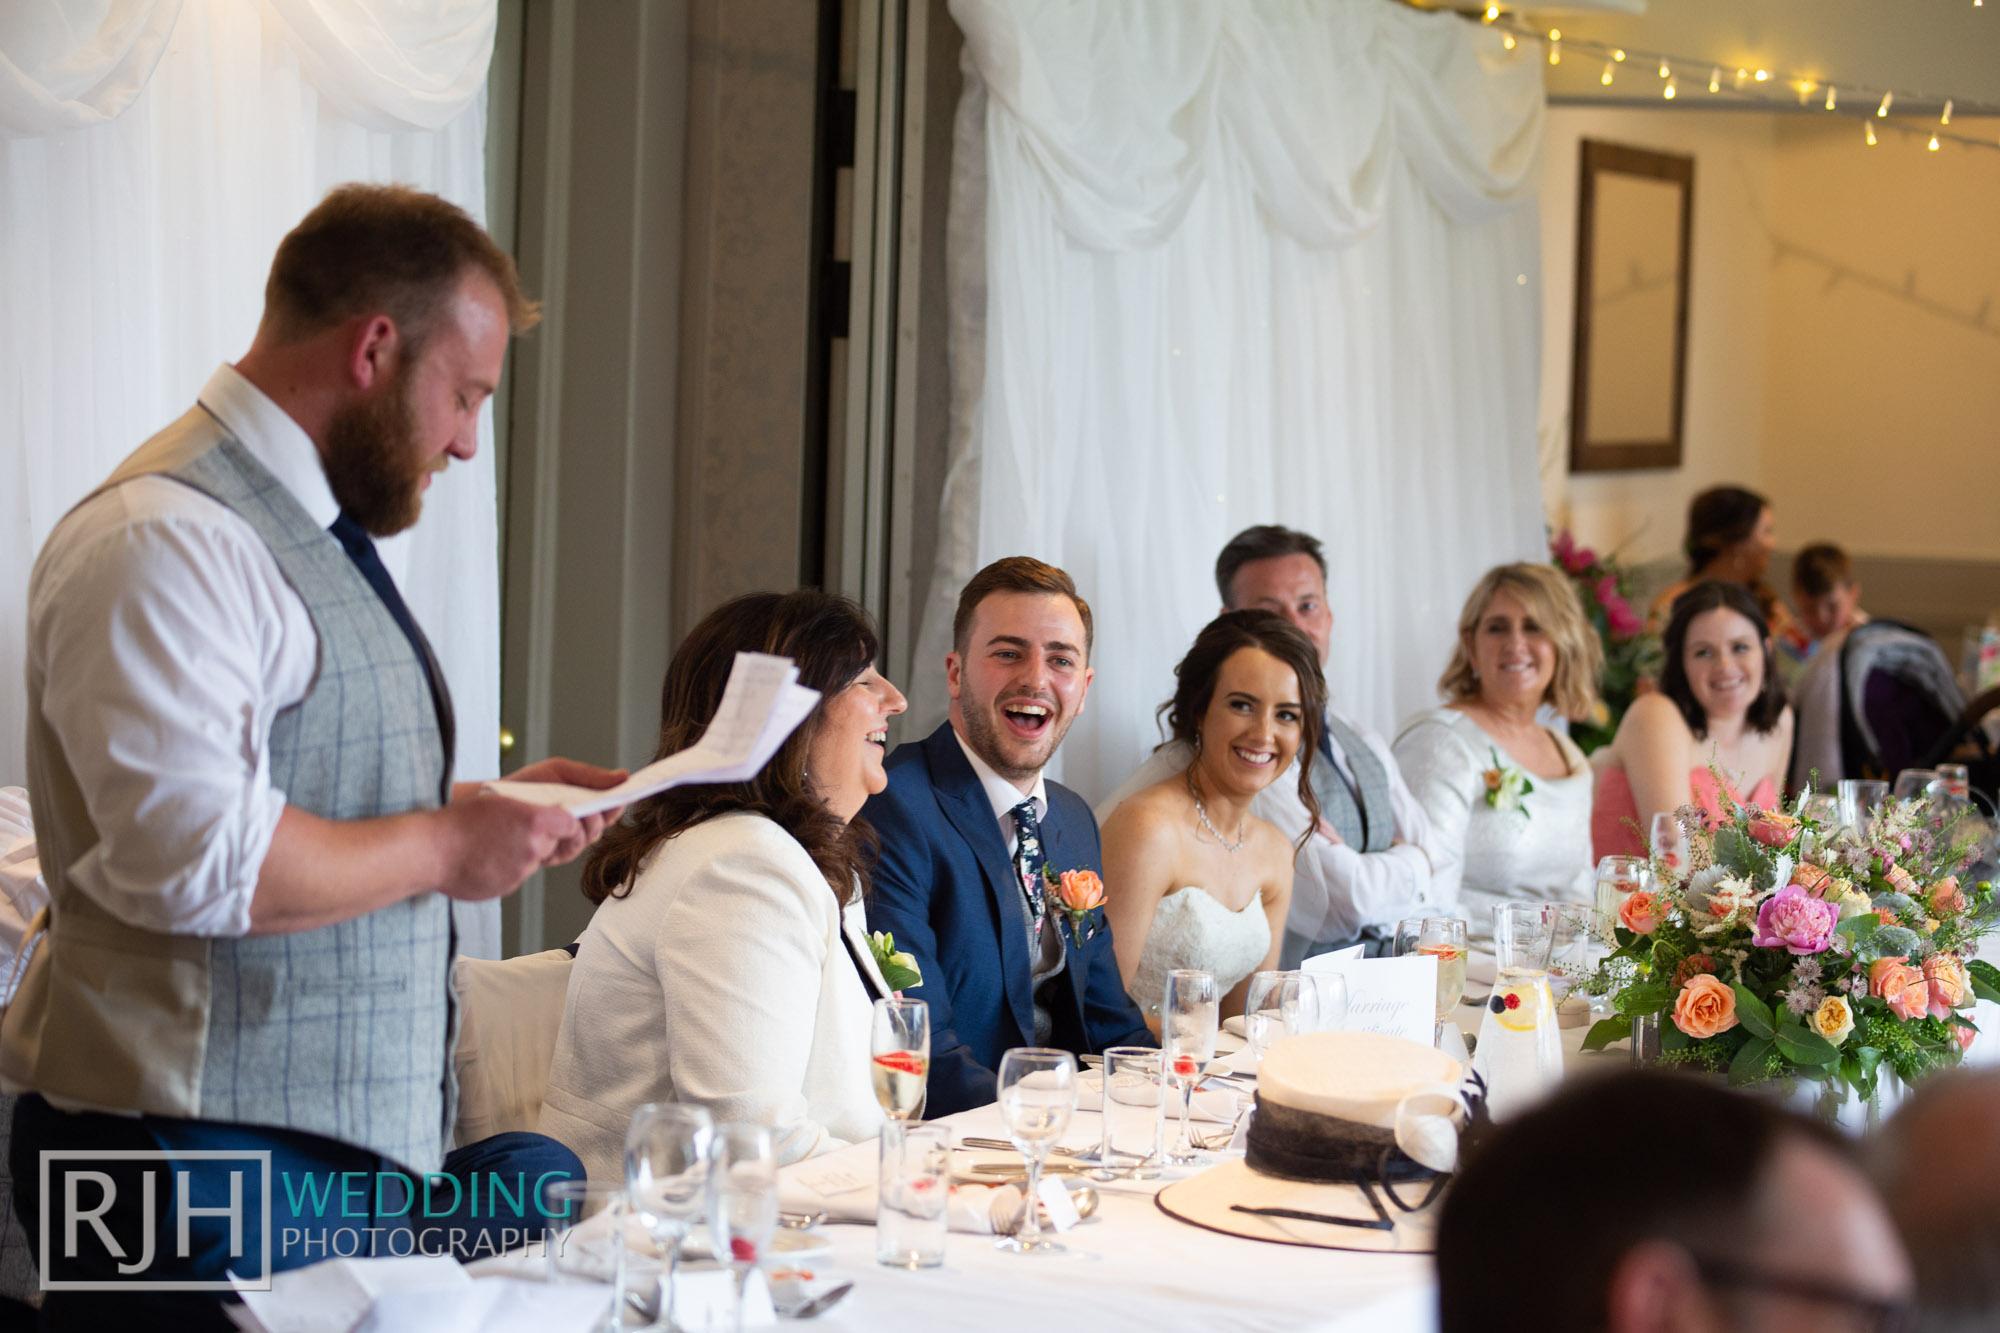 Whirlowbrook Hall Wedding Photography_Jack & Lydia_059_IMG_4591.jpg